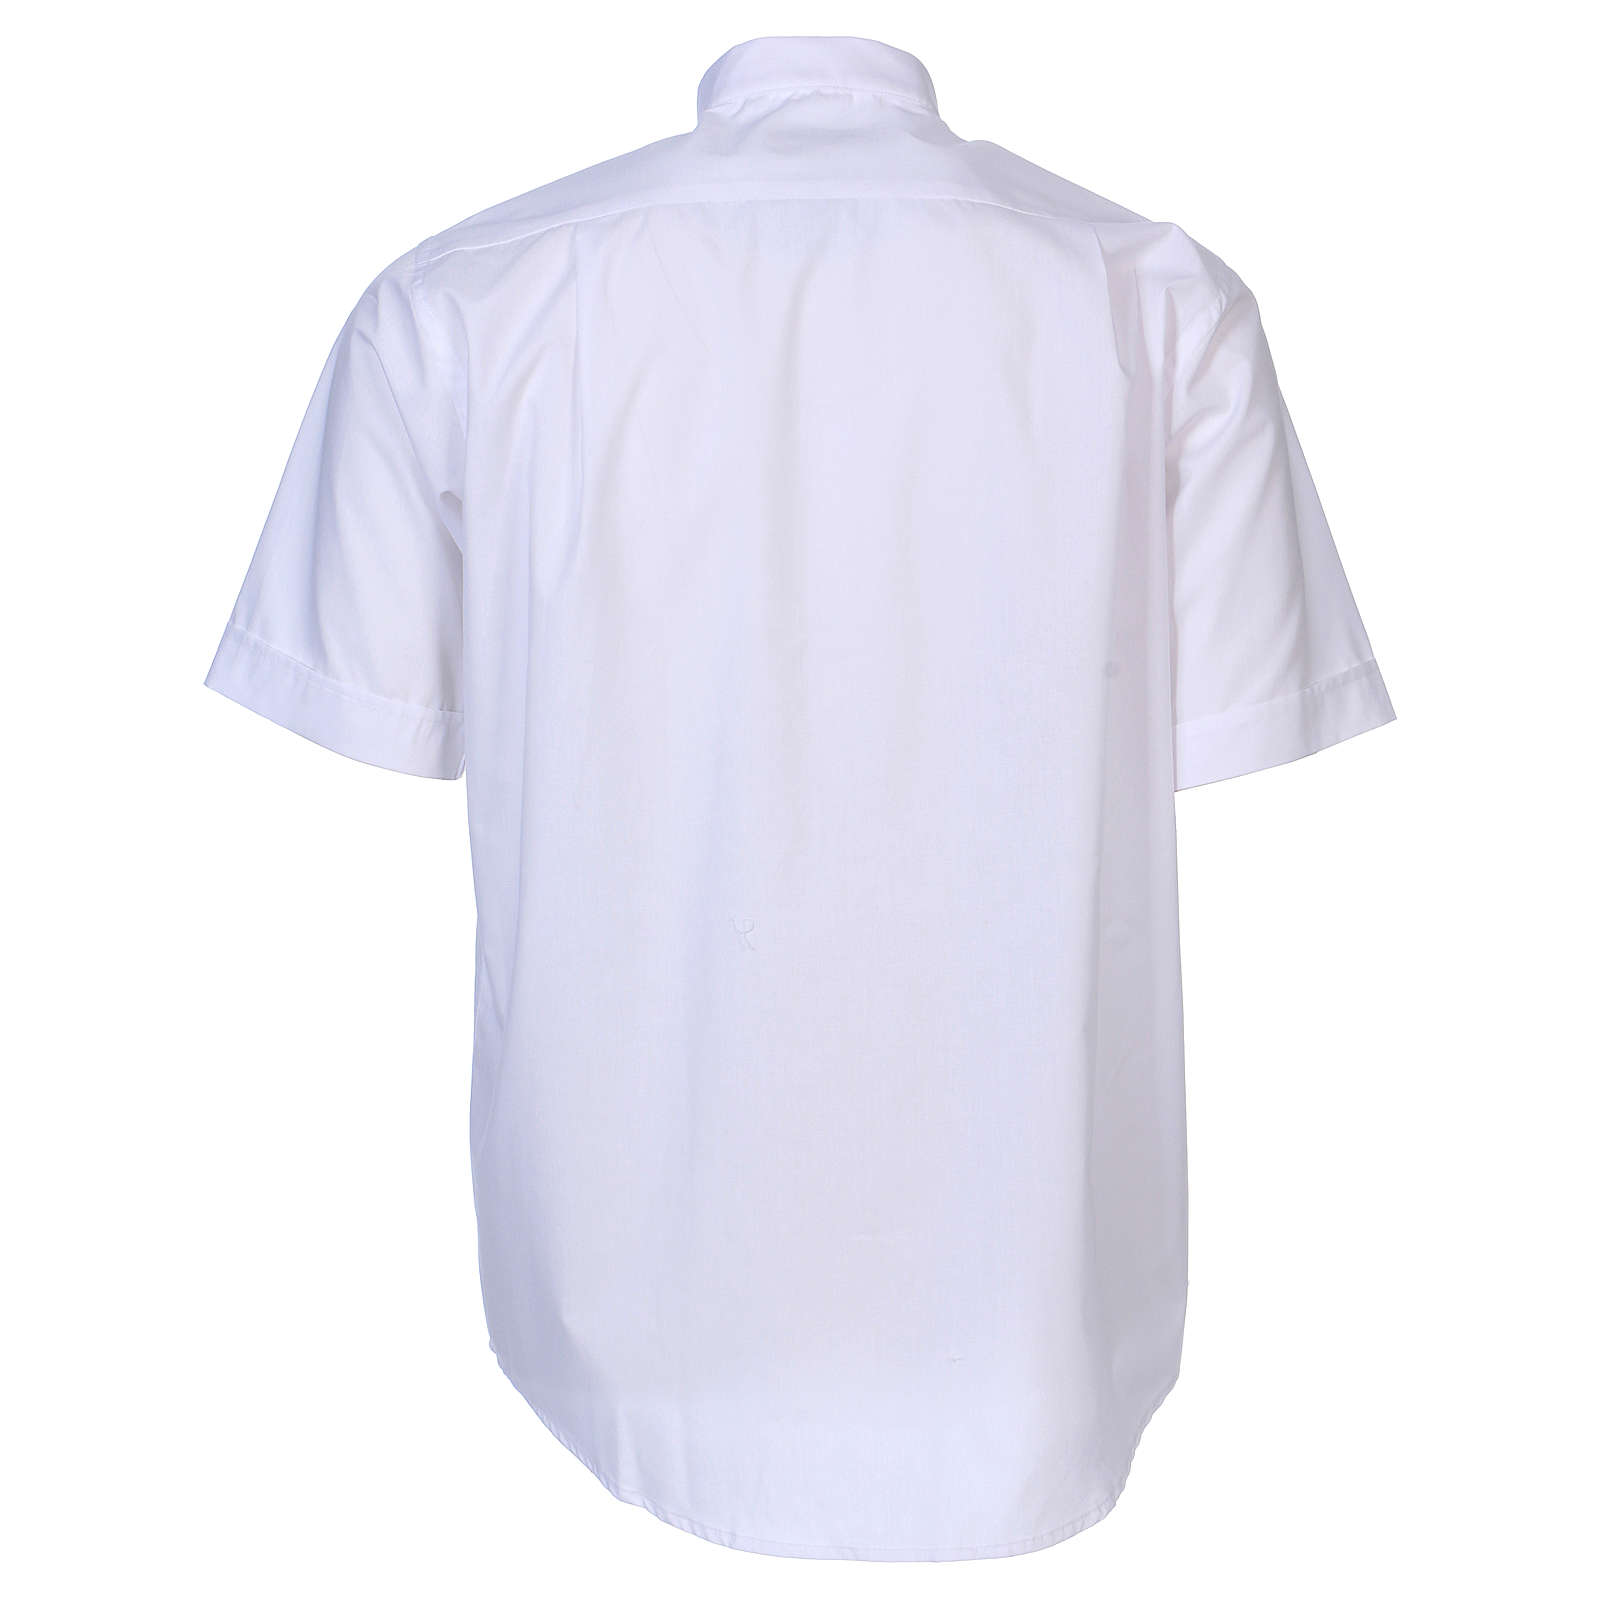 Camisa de sacerdote manga curta misto algodão branco In Primis 4